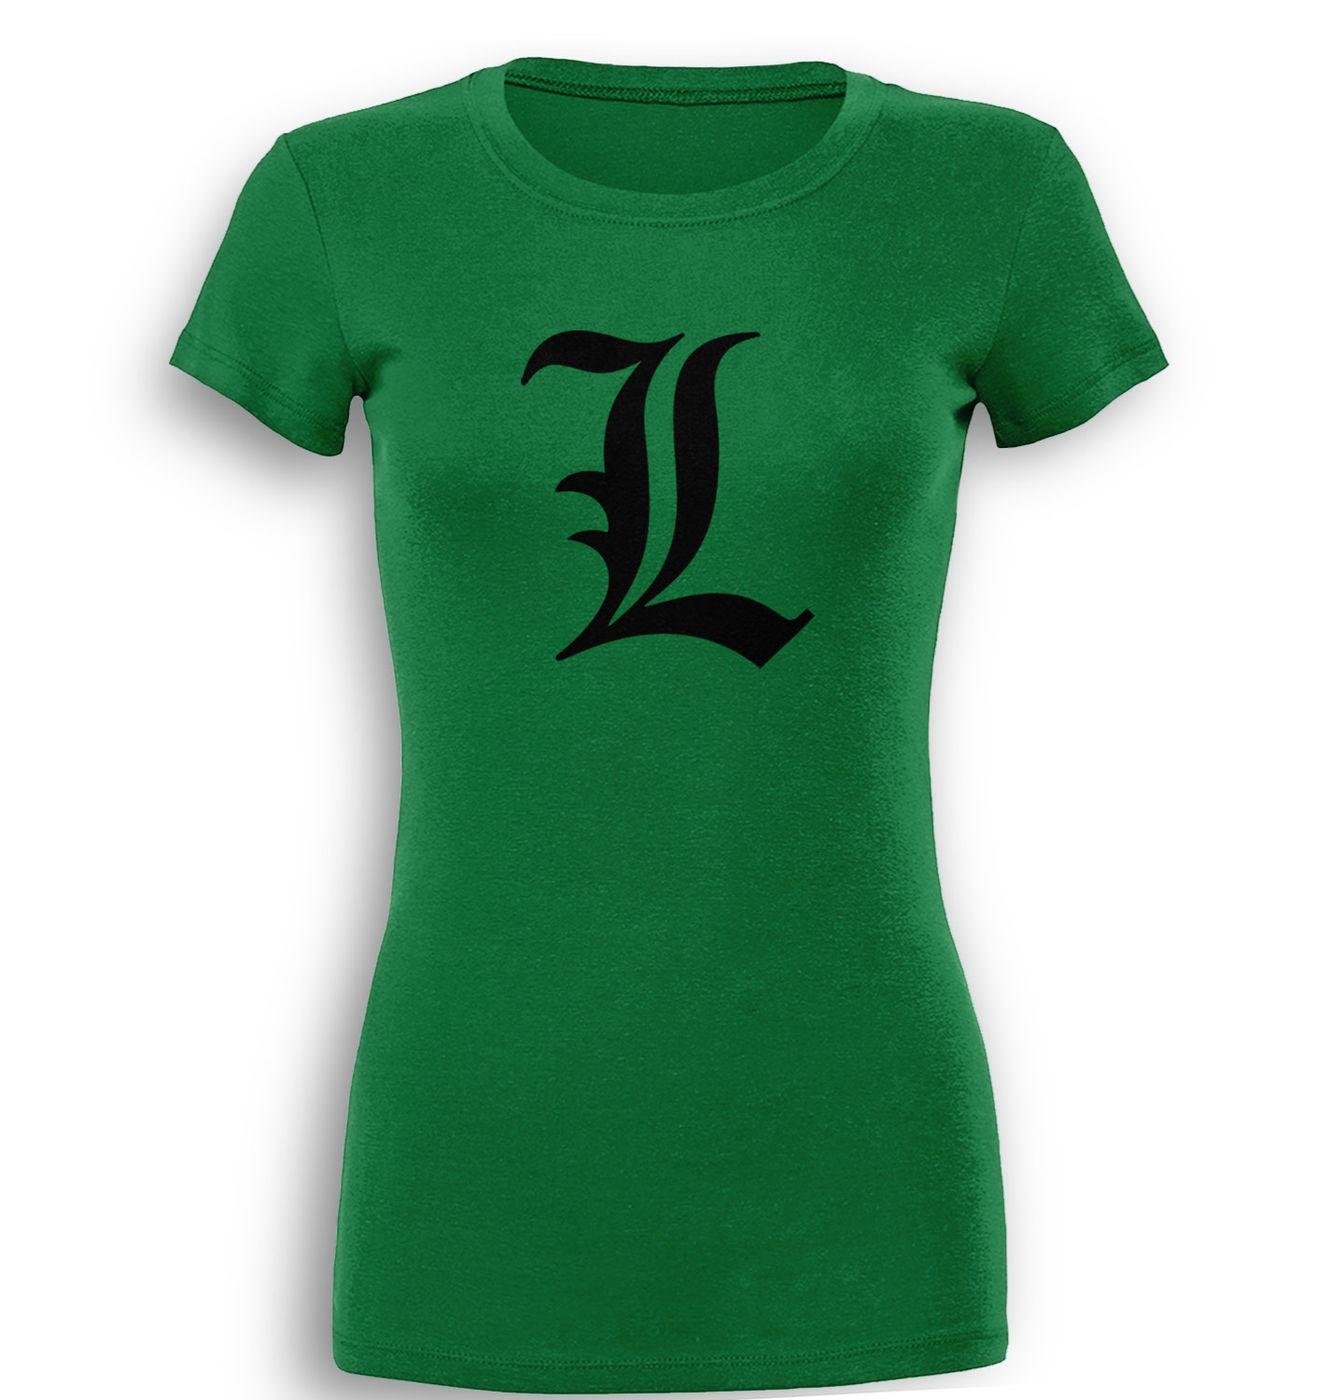 L Anime premium women's t-shirt by Something Geeky